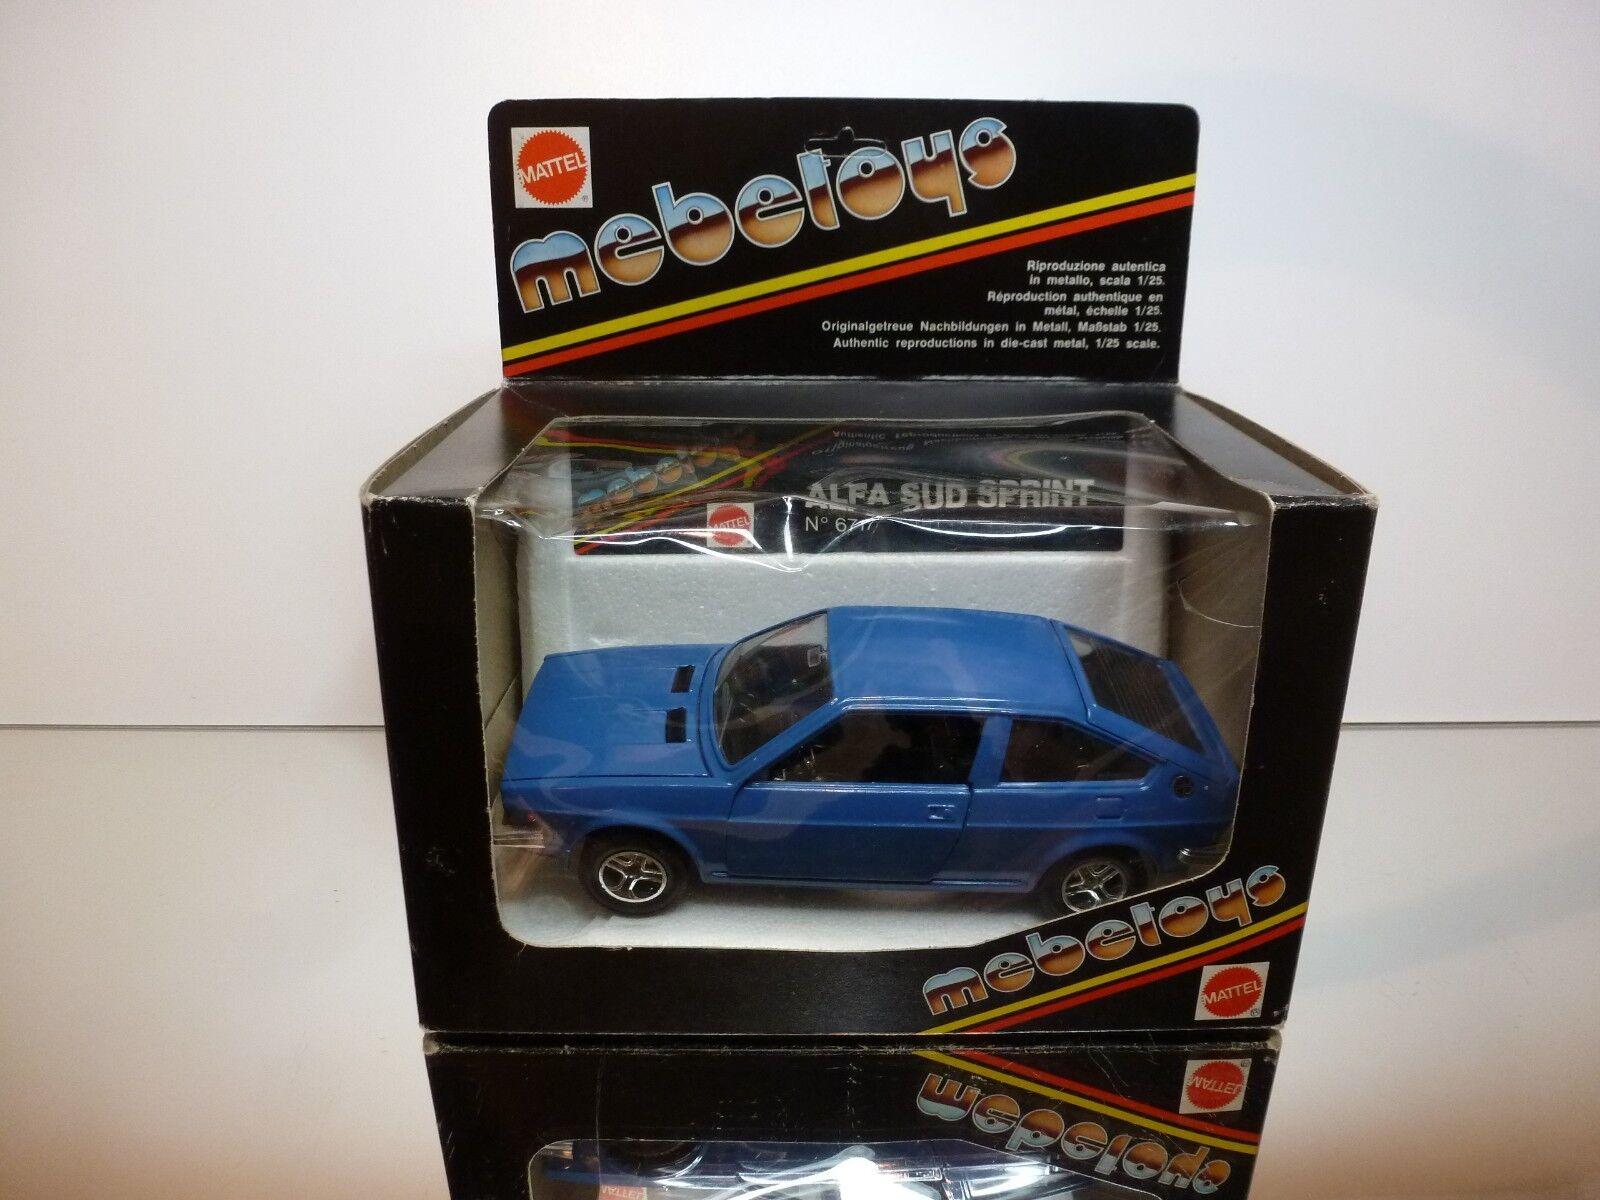 MEBETOYS 6717 ALFA ROMEO ALFA SUD SPRINT - blueE 1 24 - VERY GOOD IN BOX